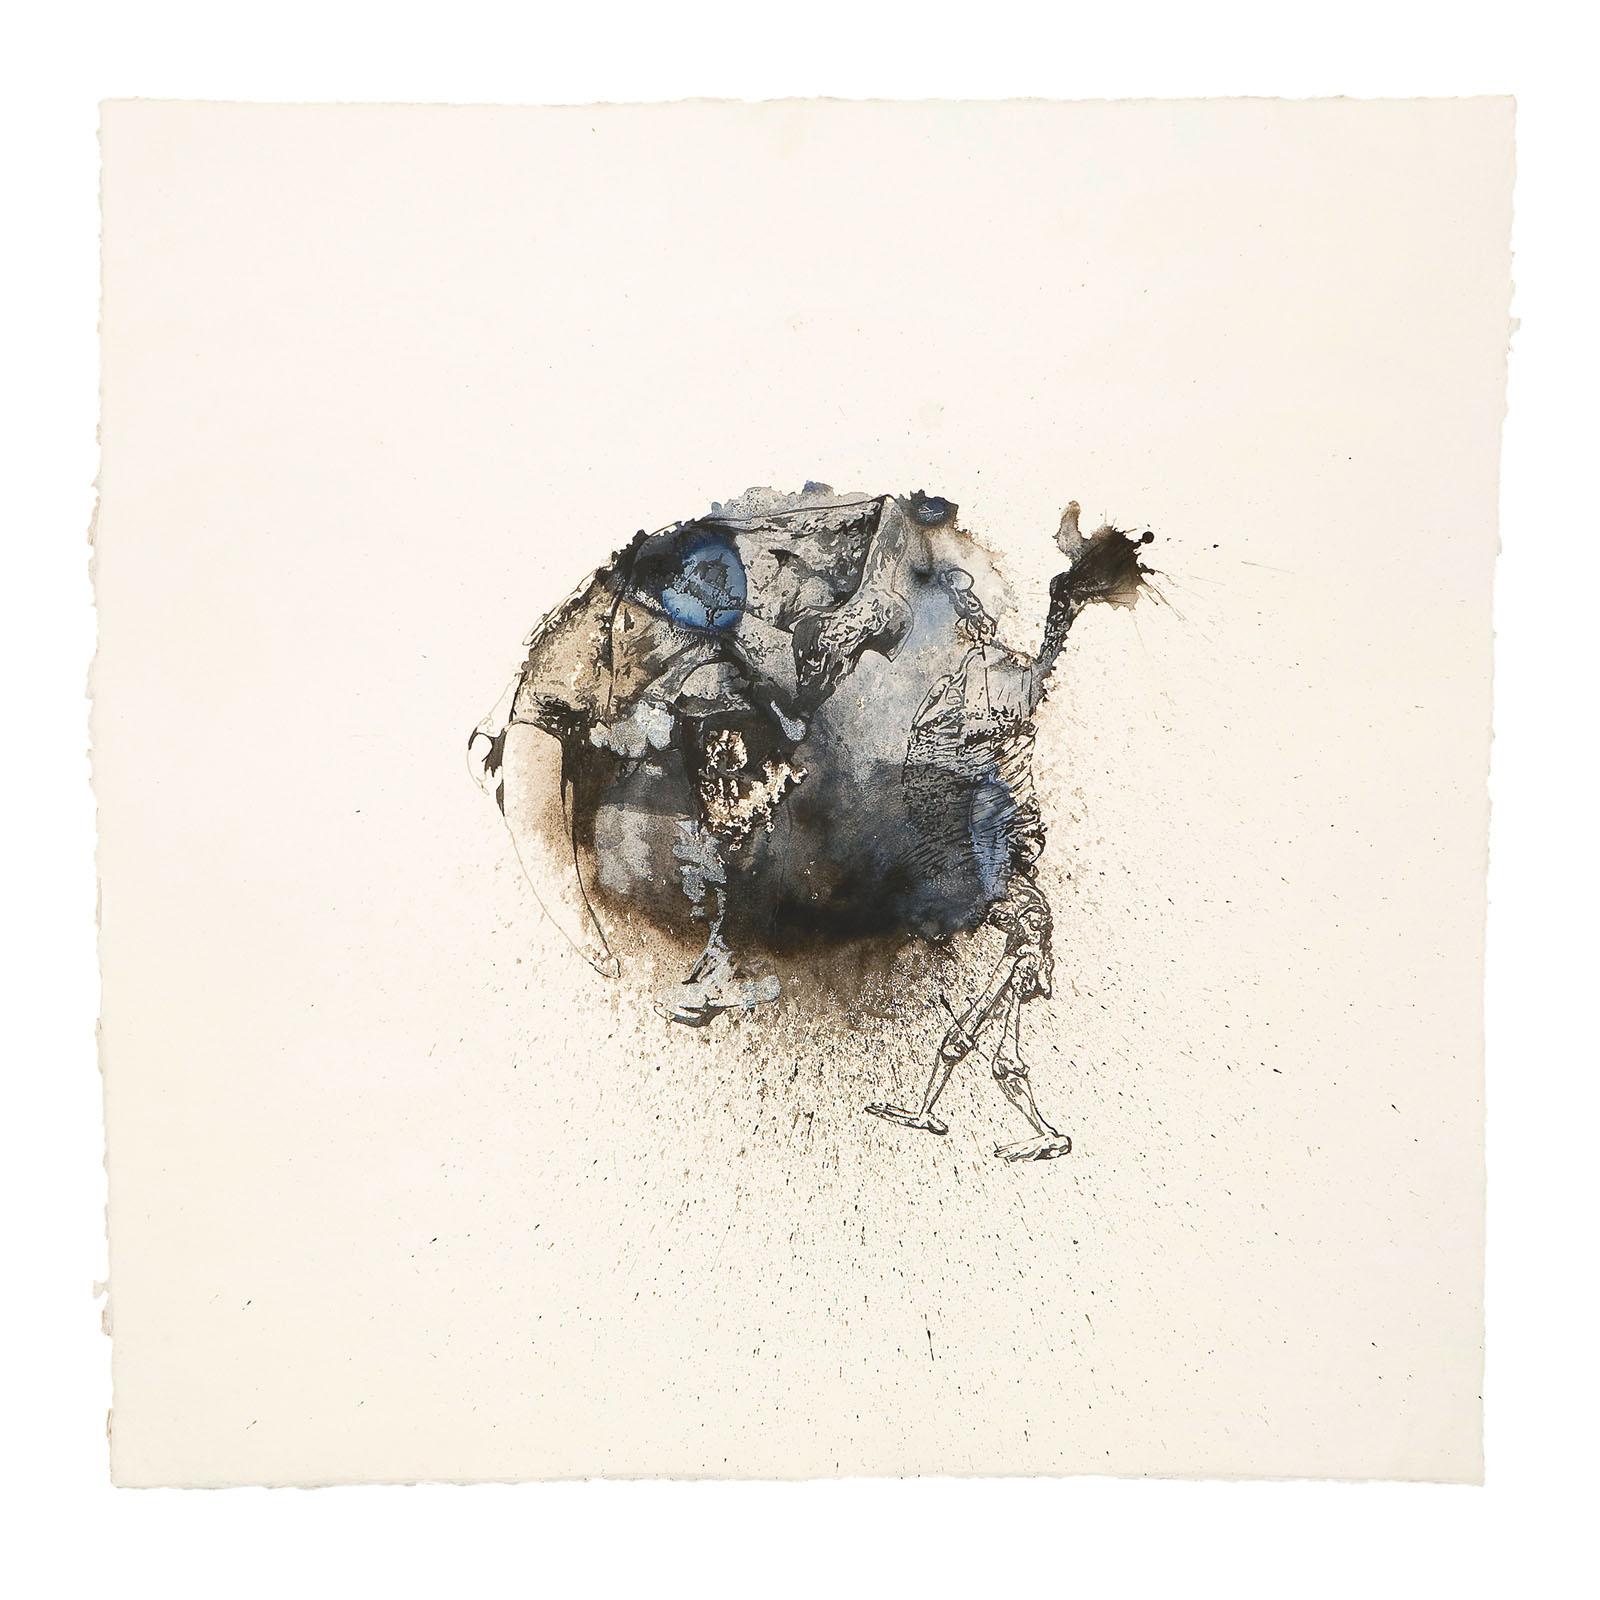 "o.T. aus ""Krähen Kommen -Titanweiß"", 2008, 105 x 105 cm, Aquarell & Tusche auf handgeschöpftem Bütten"